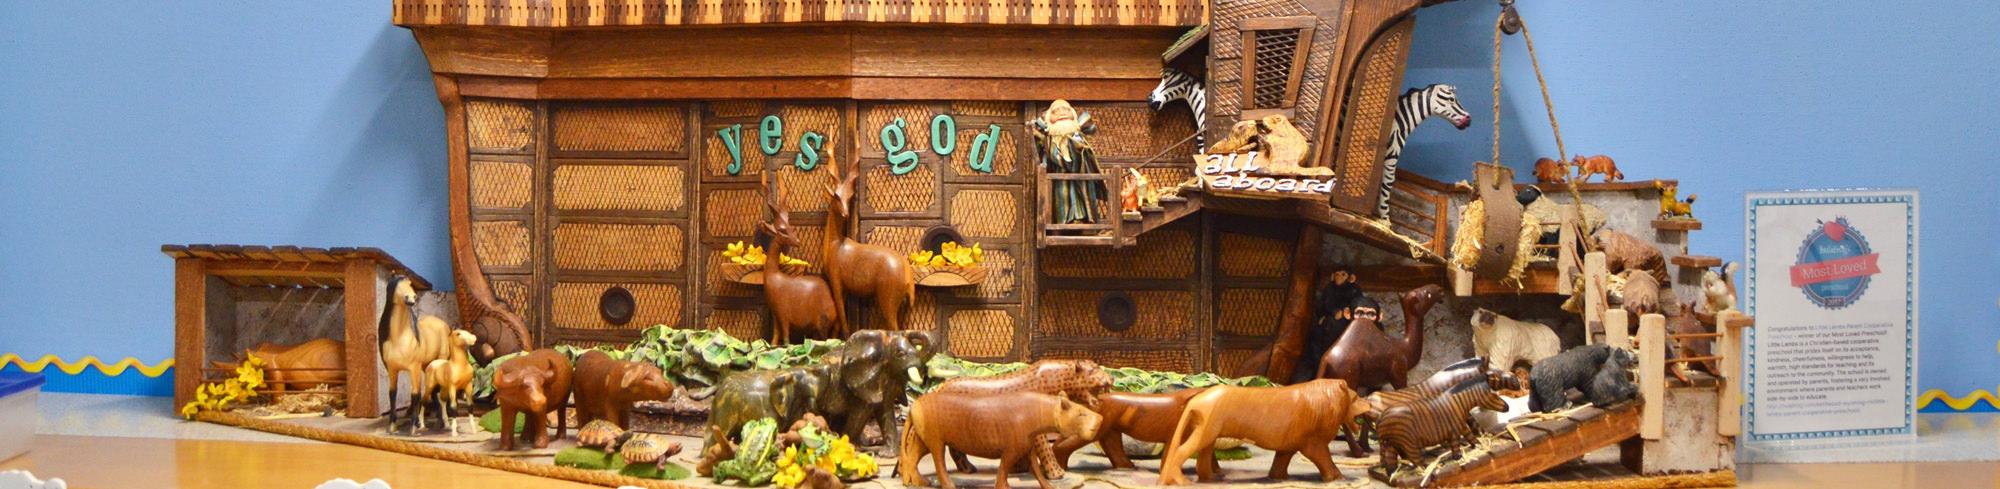 Noahs Ark display